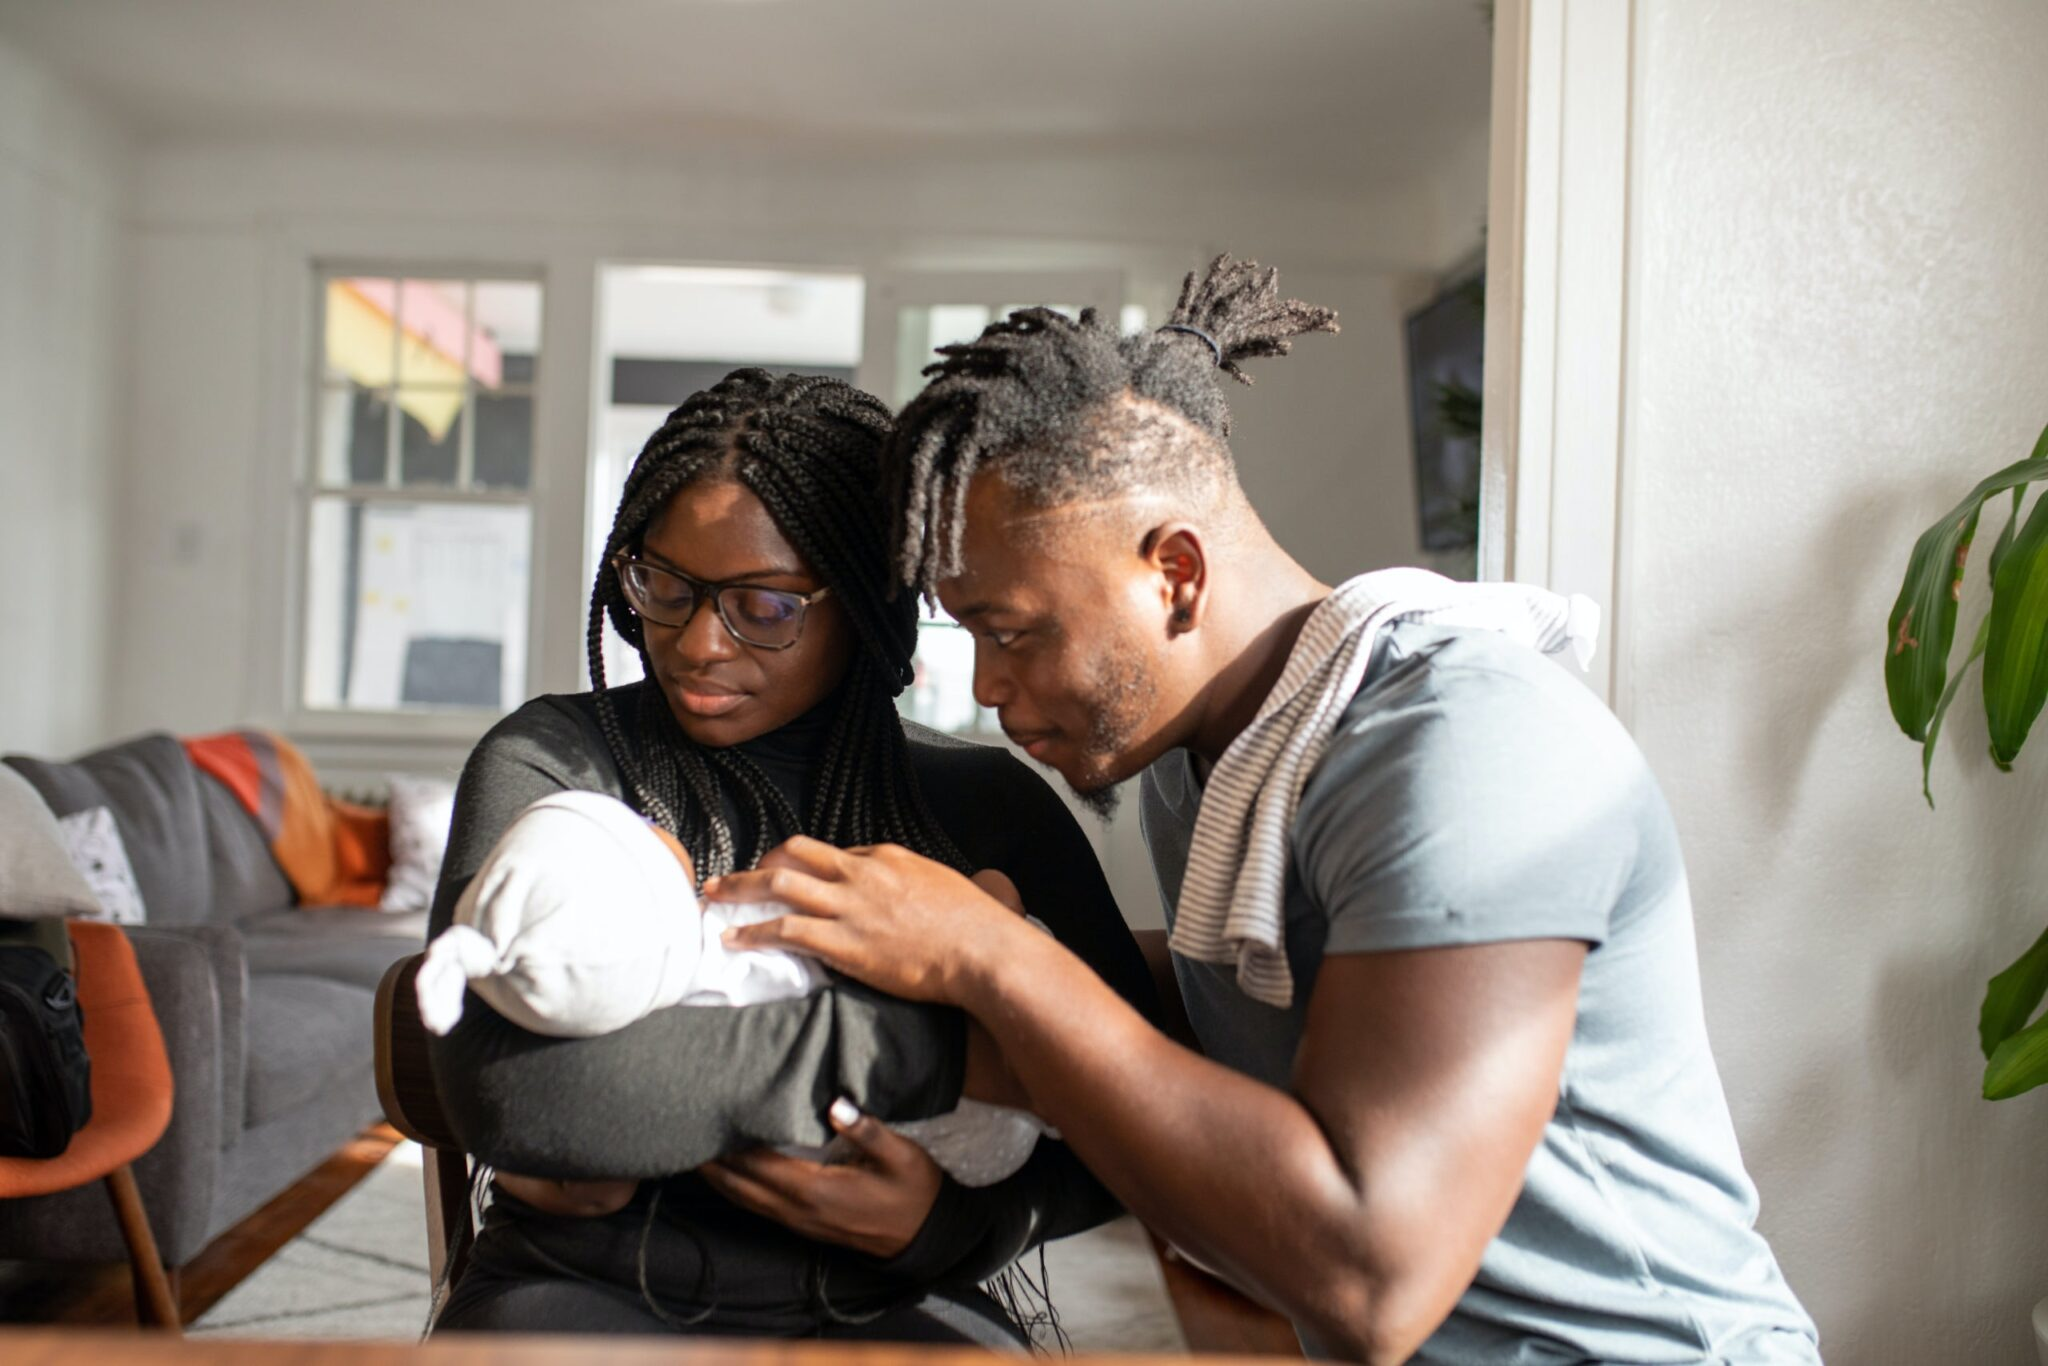 Couple holding a newborn baby